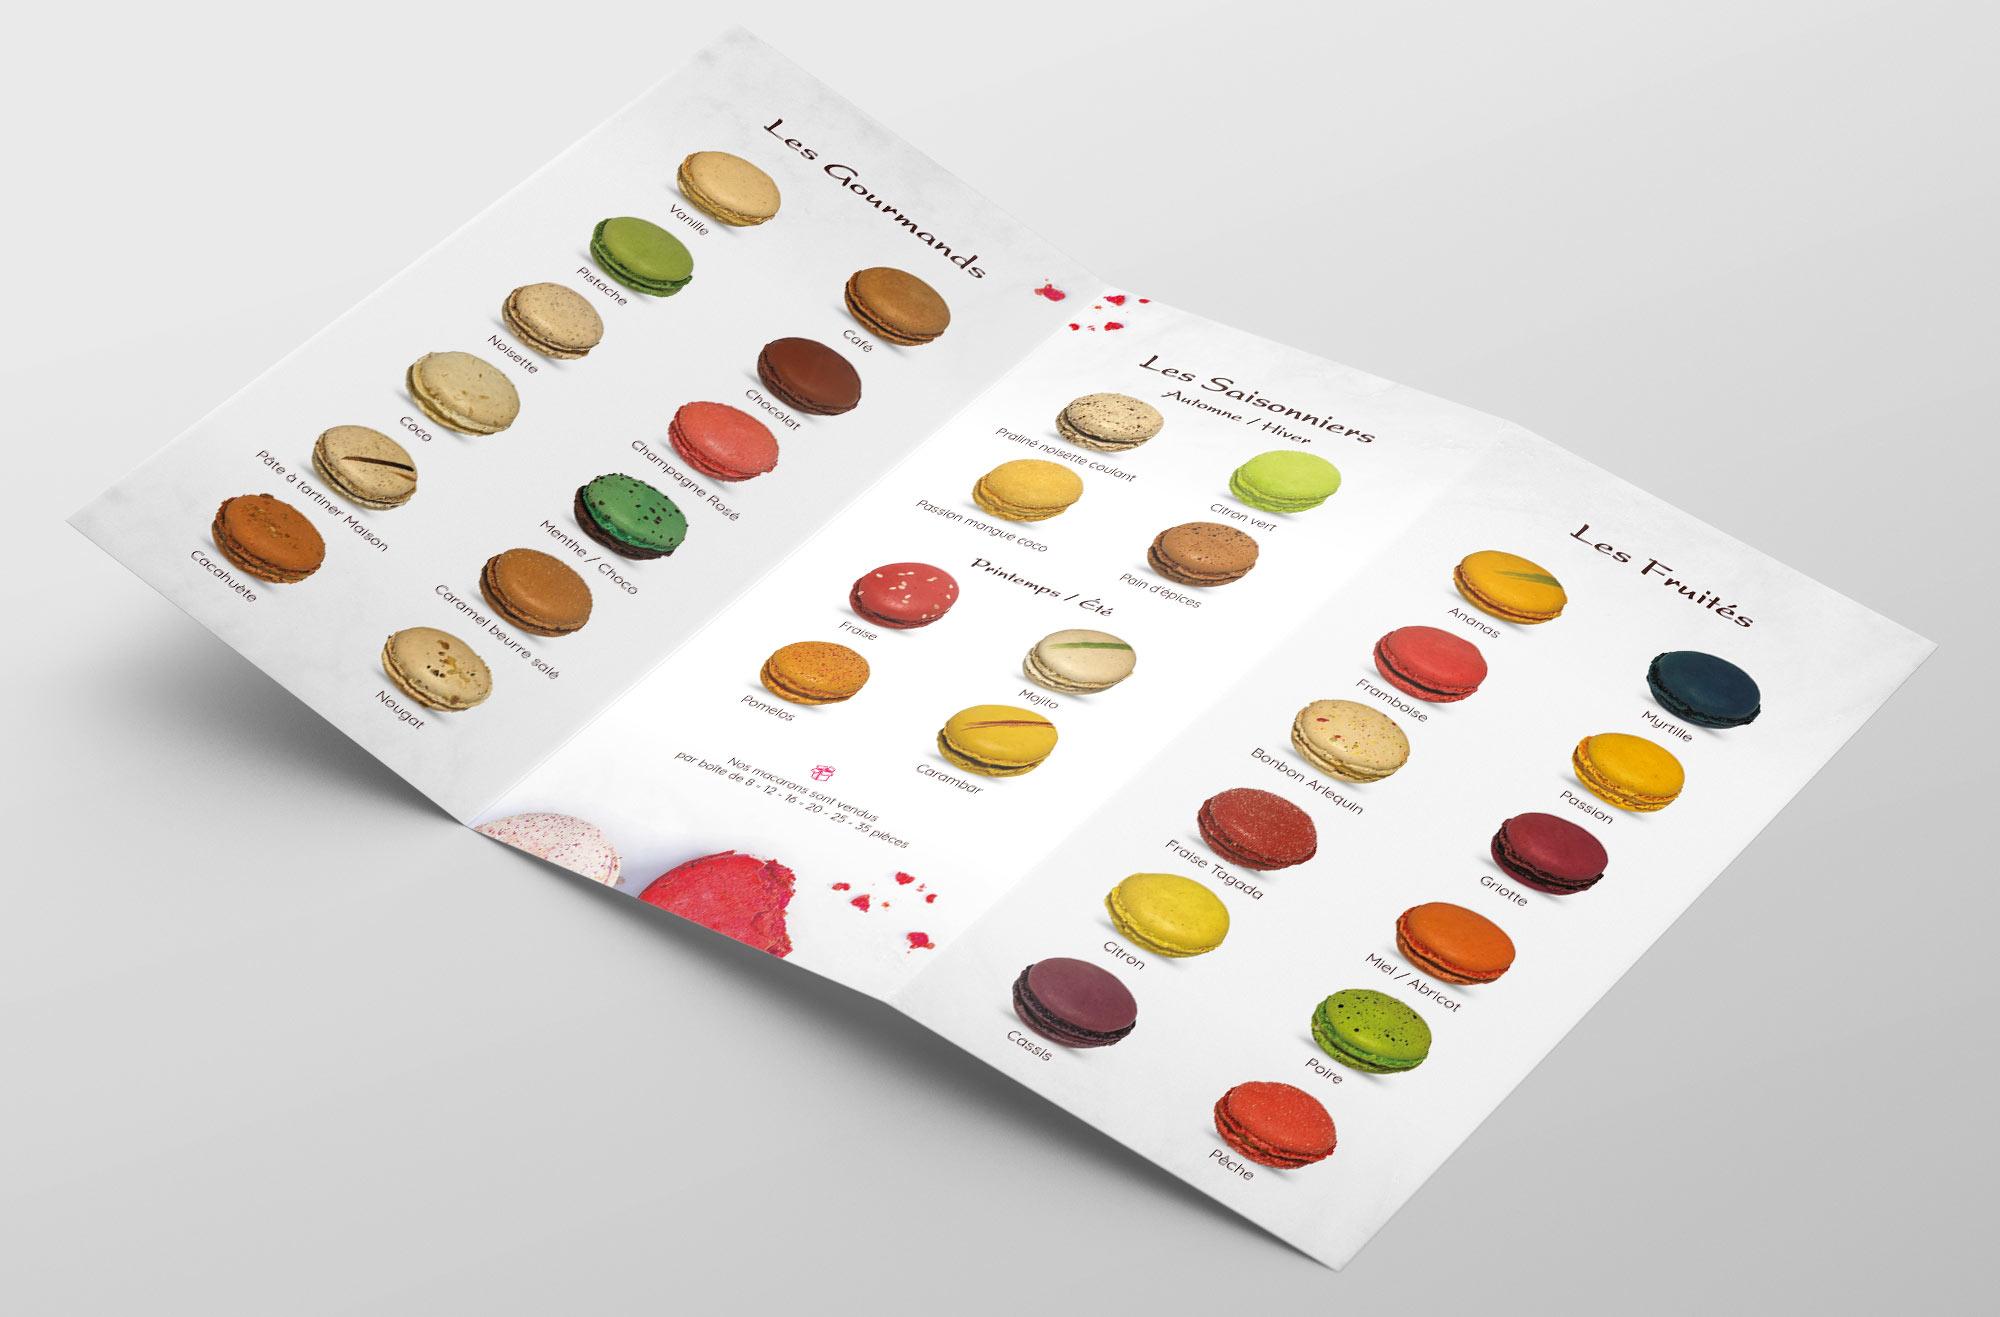 ikadia_espace-sucre-chocolat_fond4.jpg